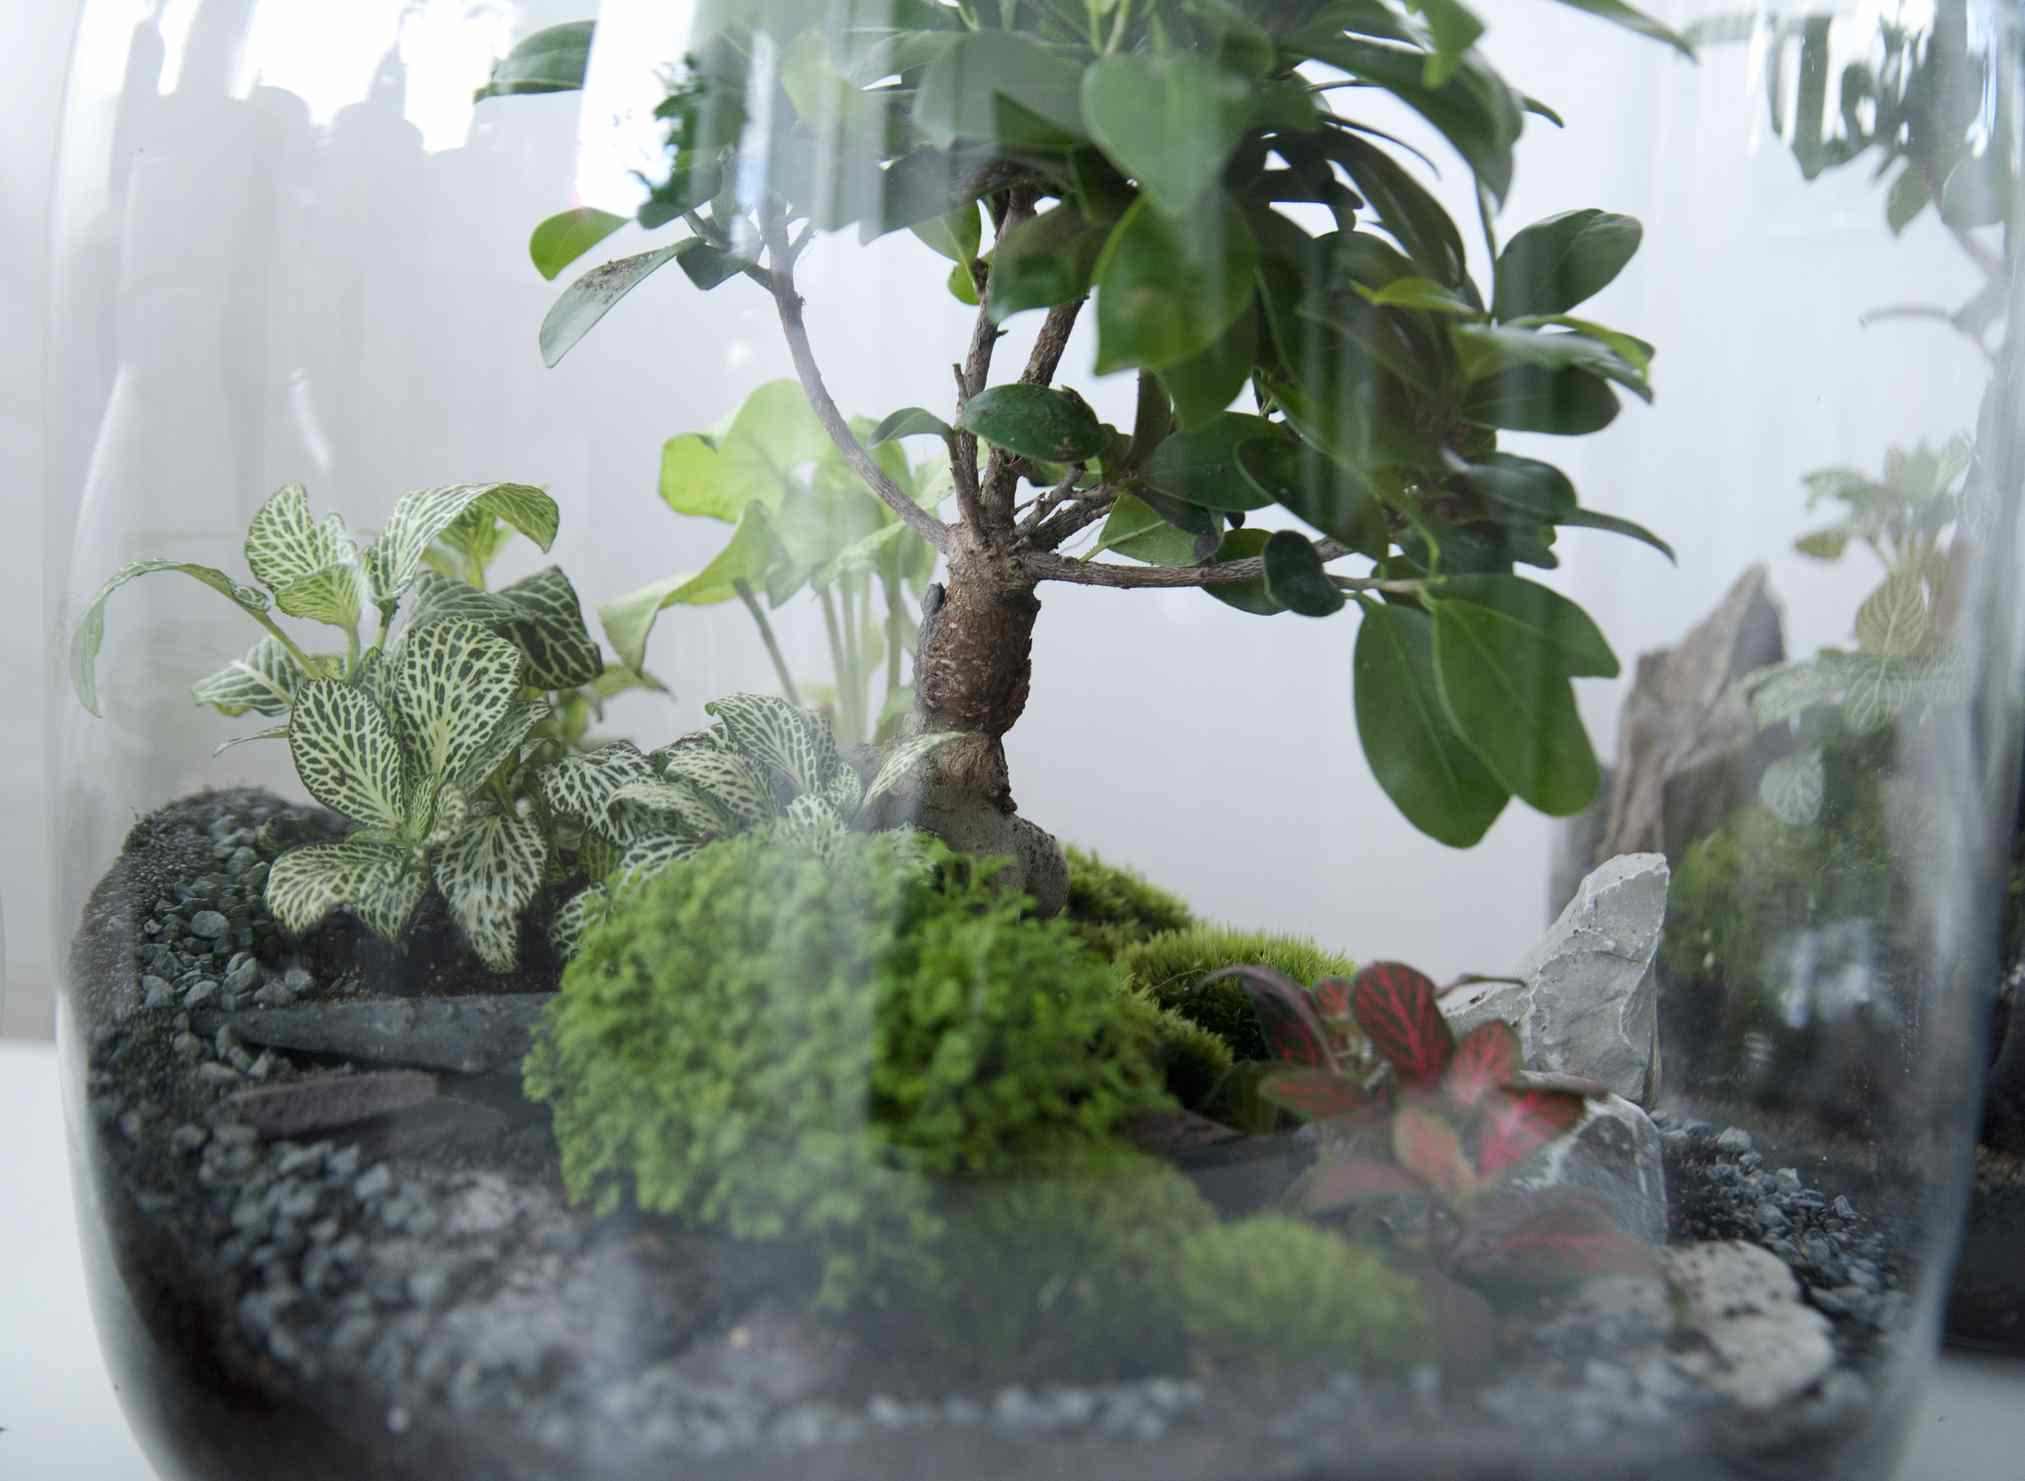 Plants growing in a terrarium mason jar.